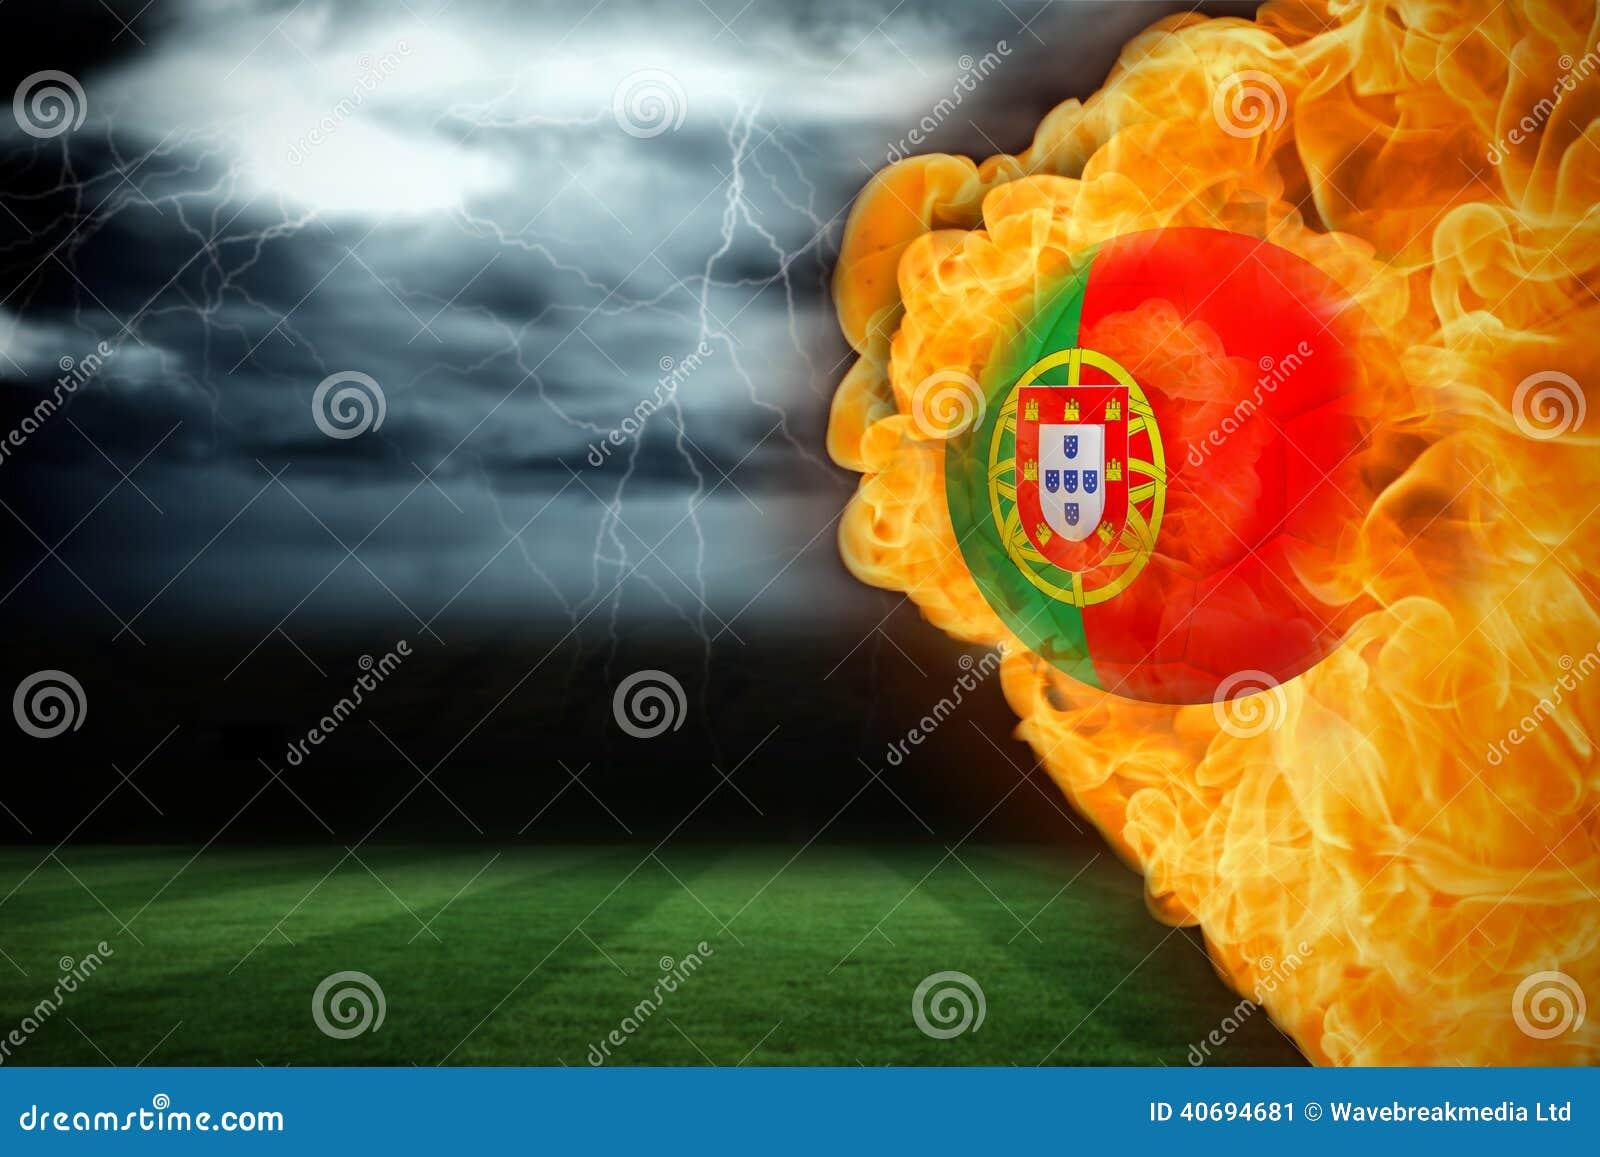 Fire Surrounding Portugal Flag Football Stock Illustration Illustration Of Football Activity 40694681